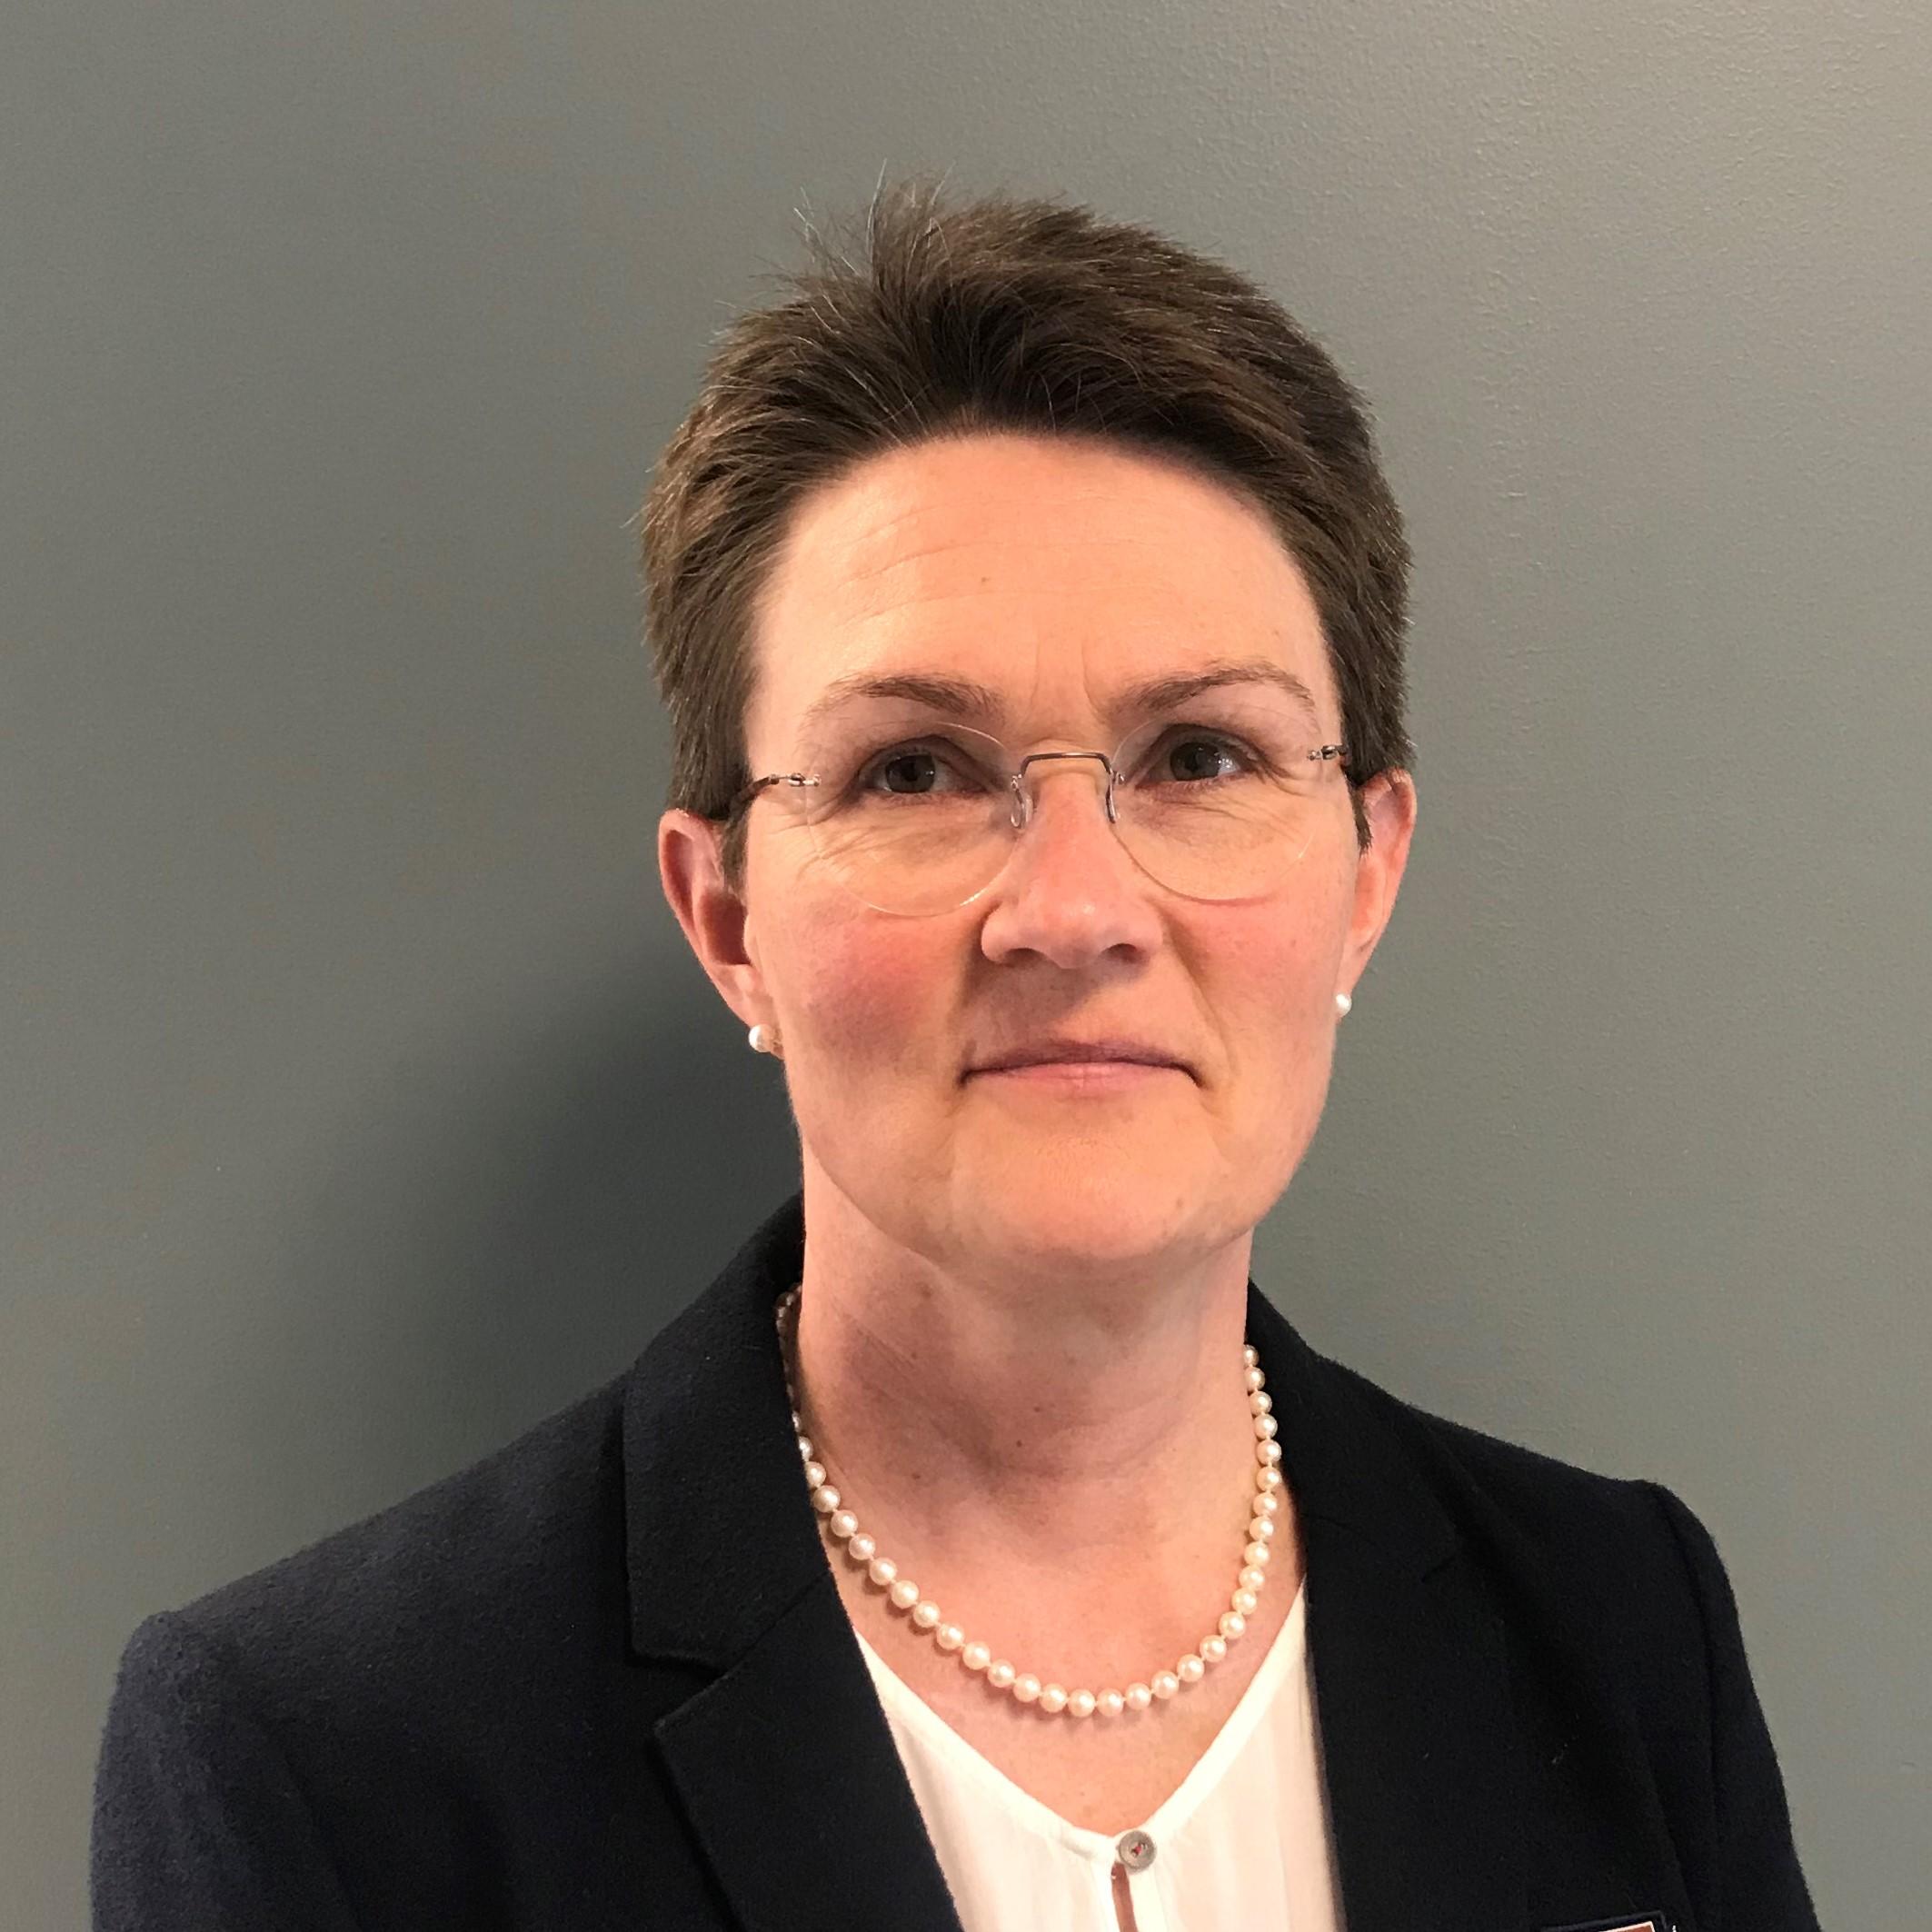 Lena Cedergren